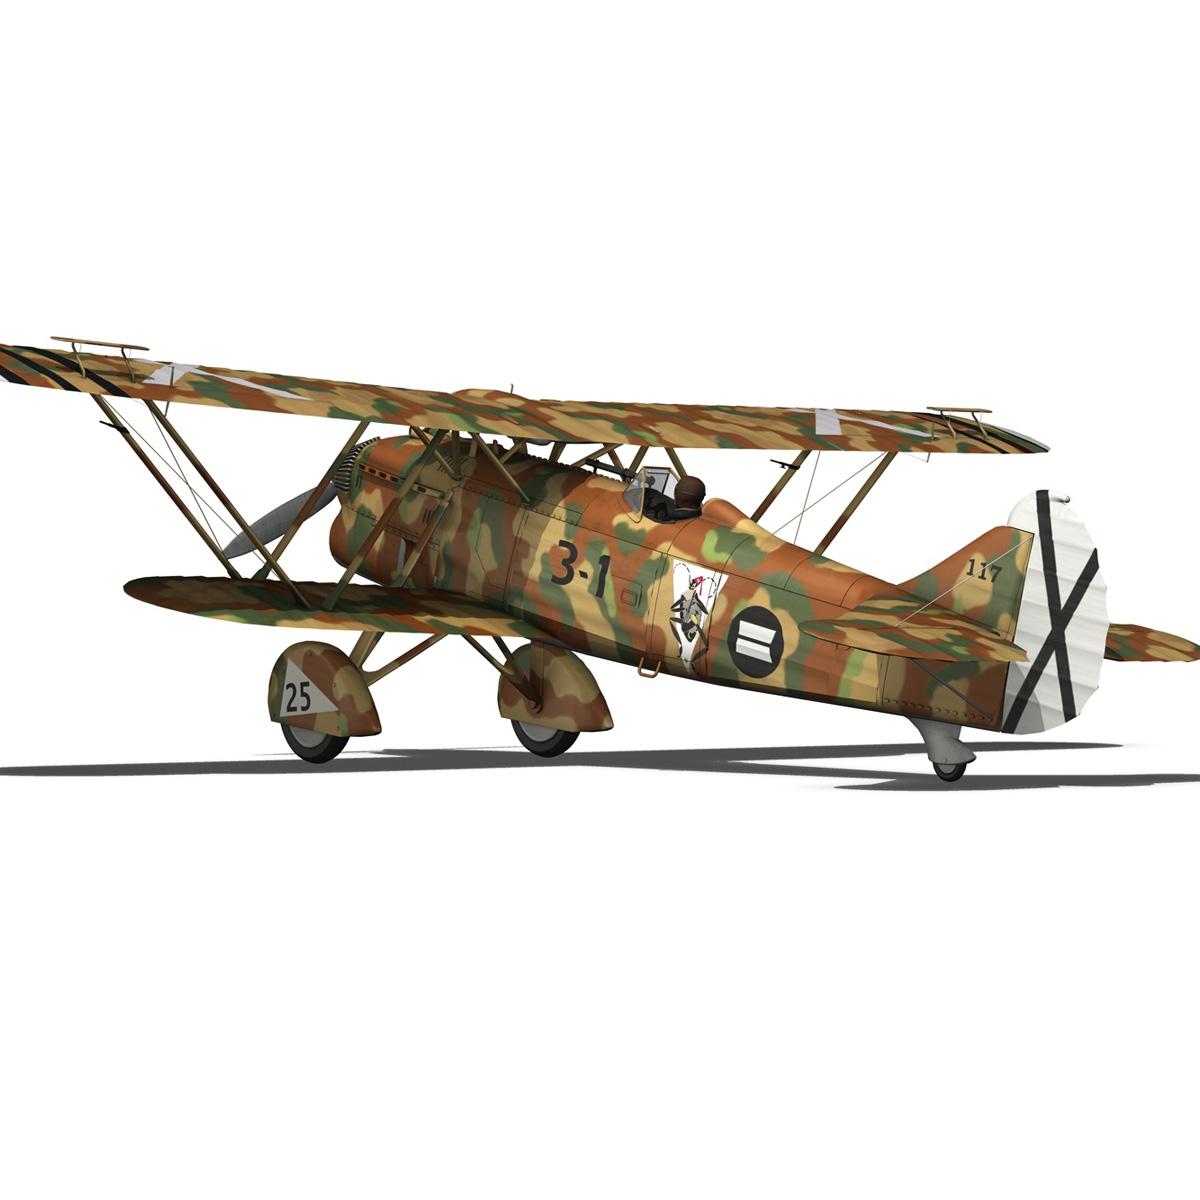 fiat cr.32 – italy air force – xvi gruppo 3d model fbx lwo lw lws obj c4d 266312